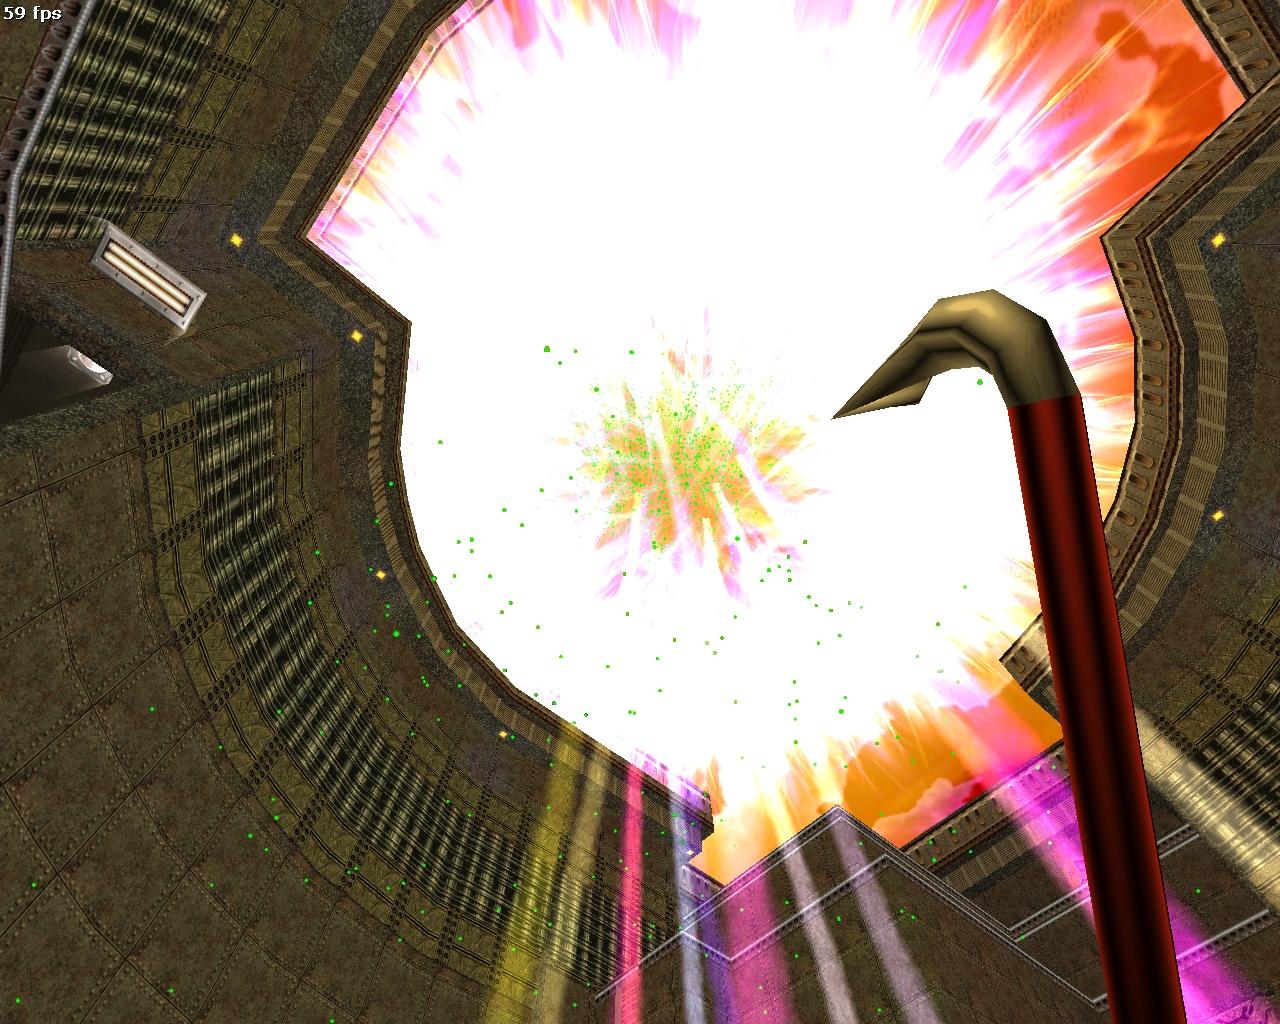 hldm_shovq2dm10002.jpg - Half-Life